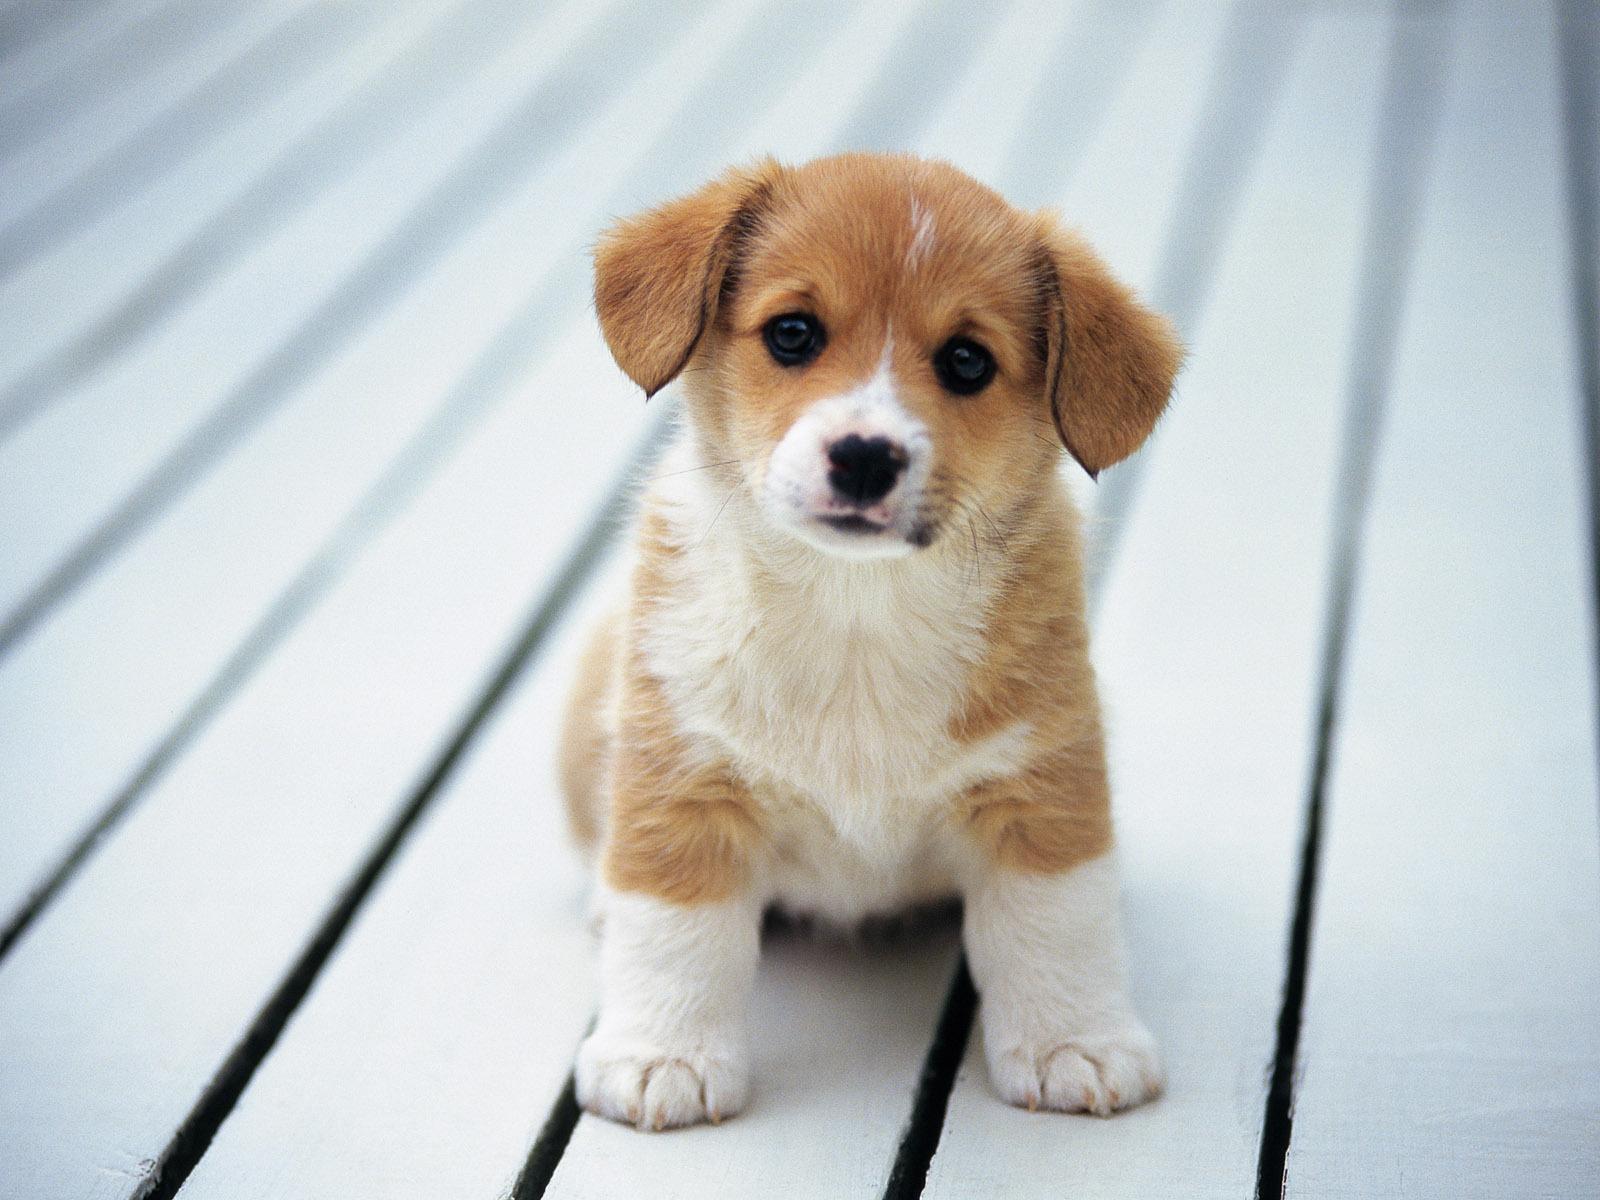 Cute Puppy Wallpapers wallpaper Cute Puppy Wallpapers hd wallpaper 1600x1200